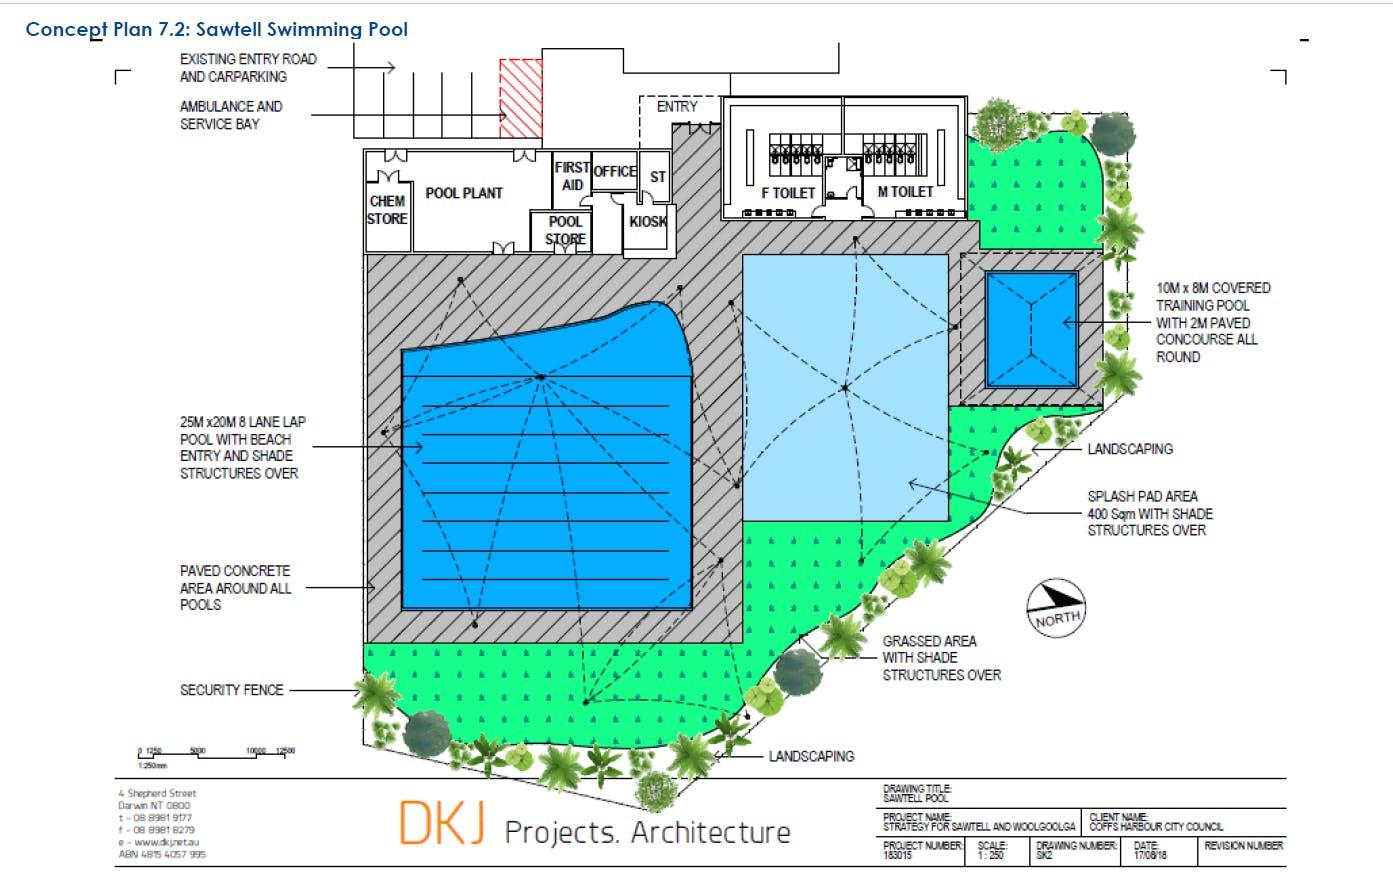 Sawtell Concept Plan